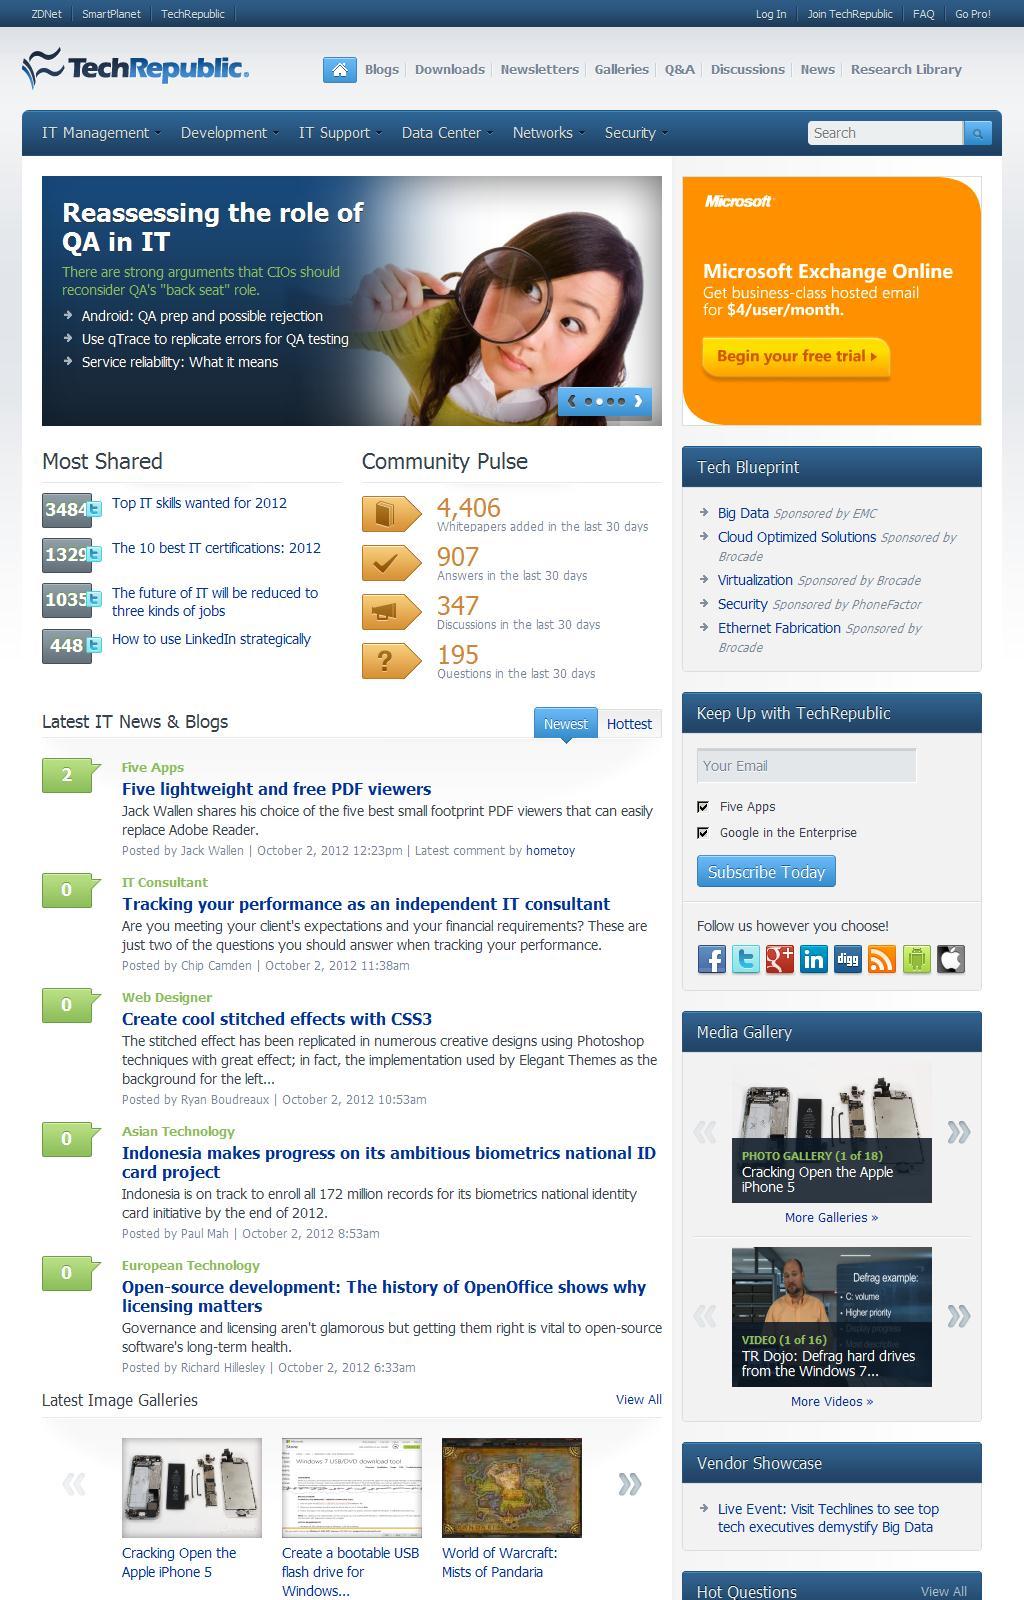 TechRepublic - A Resource for IT Professionals